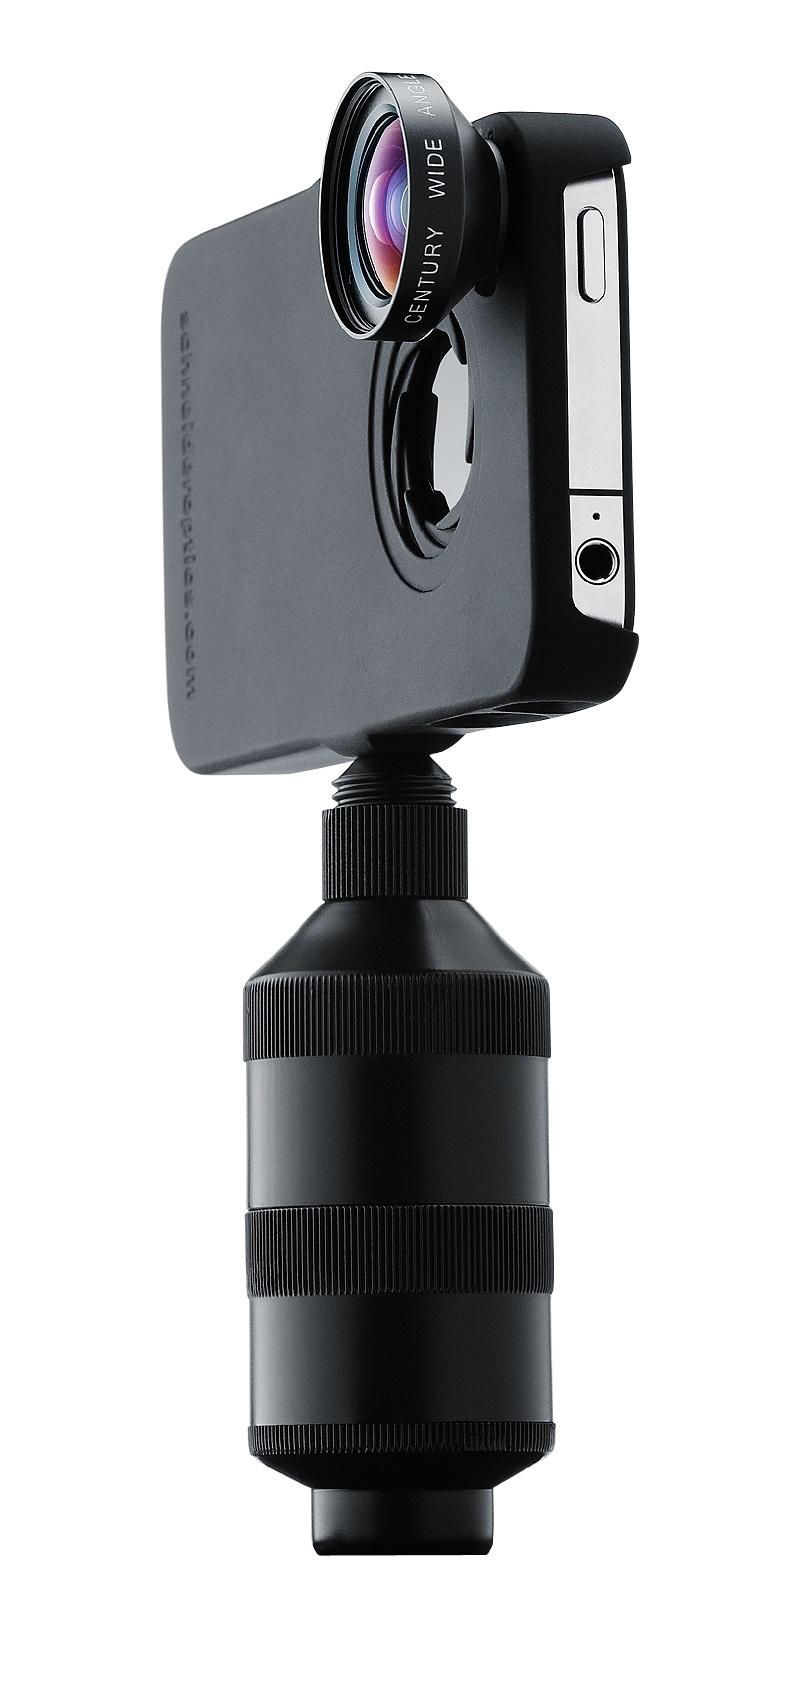 schneider-optics-ipro-lens1